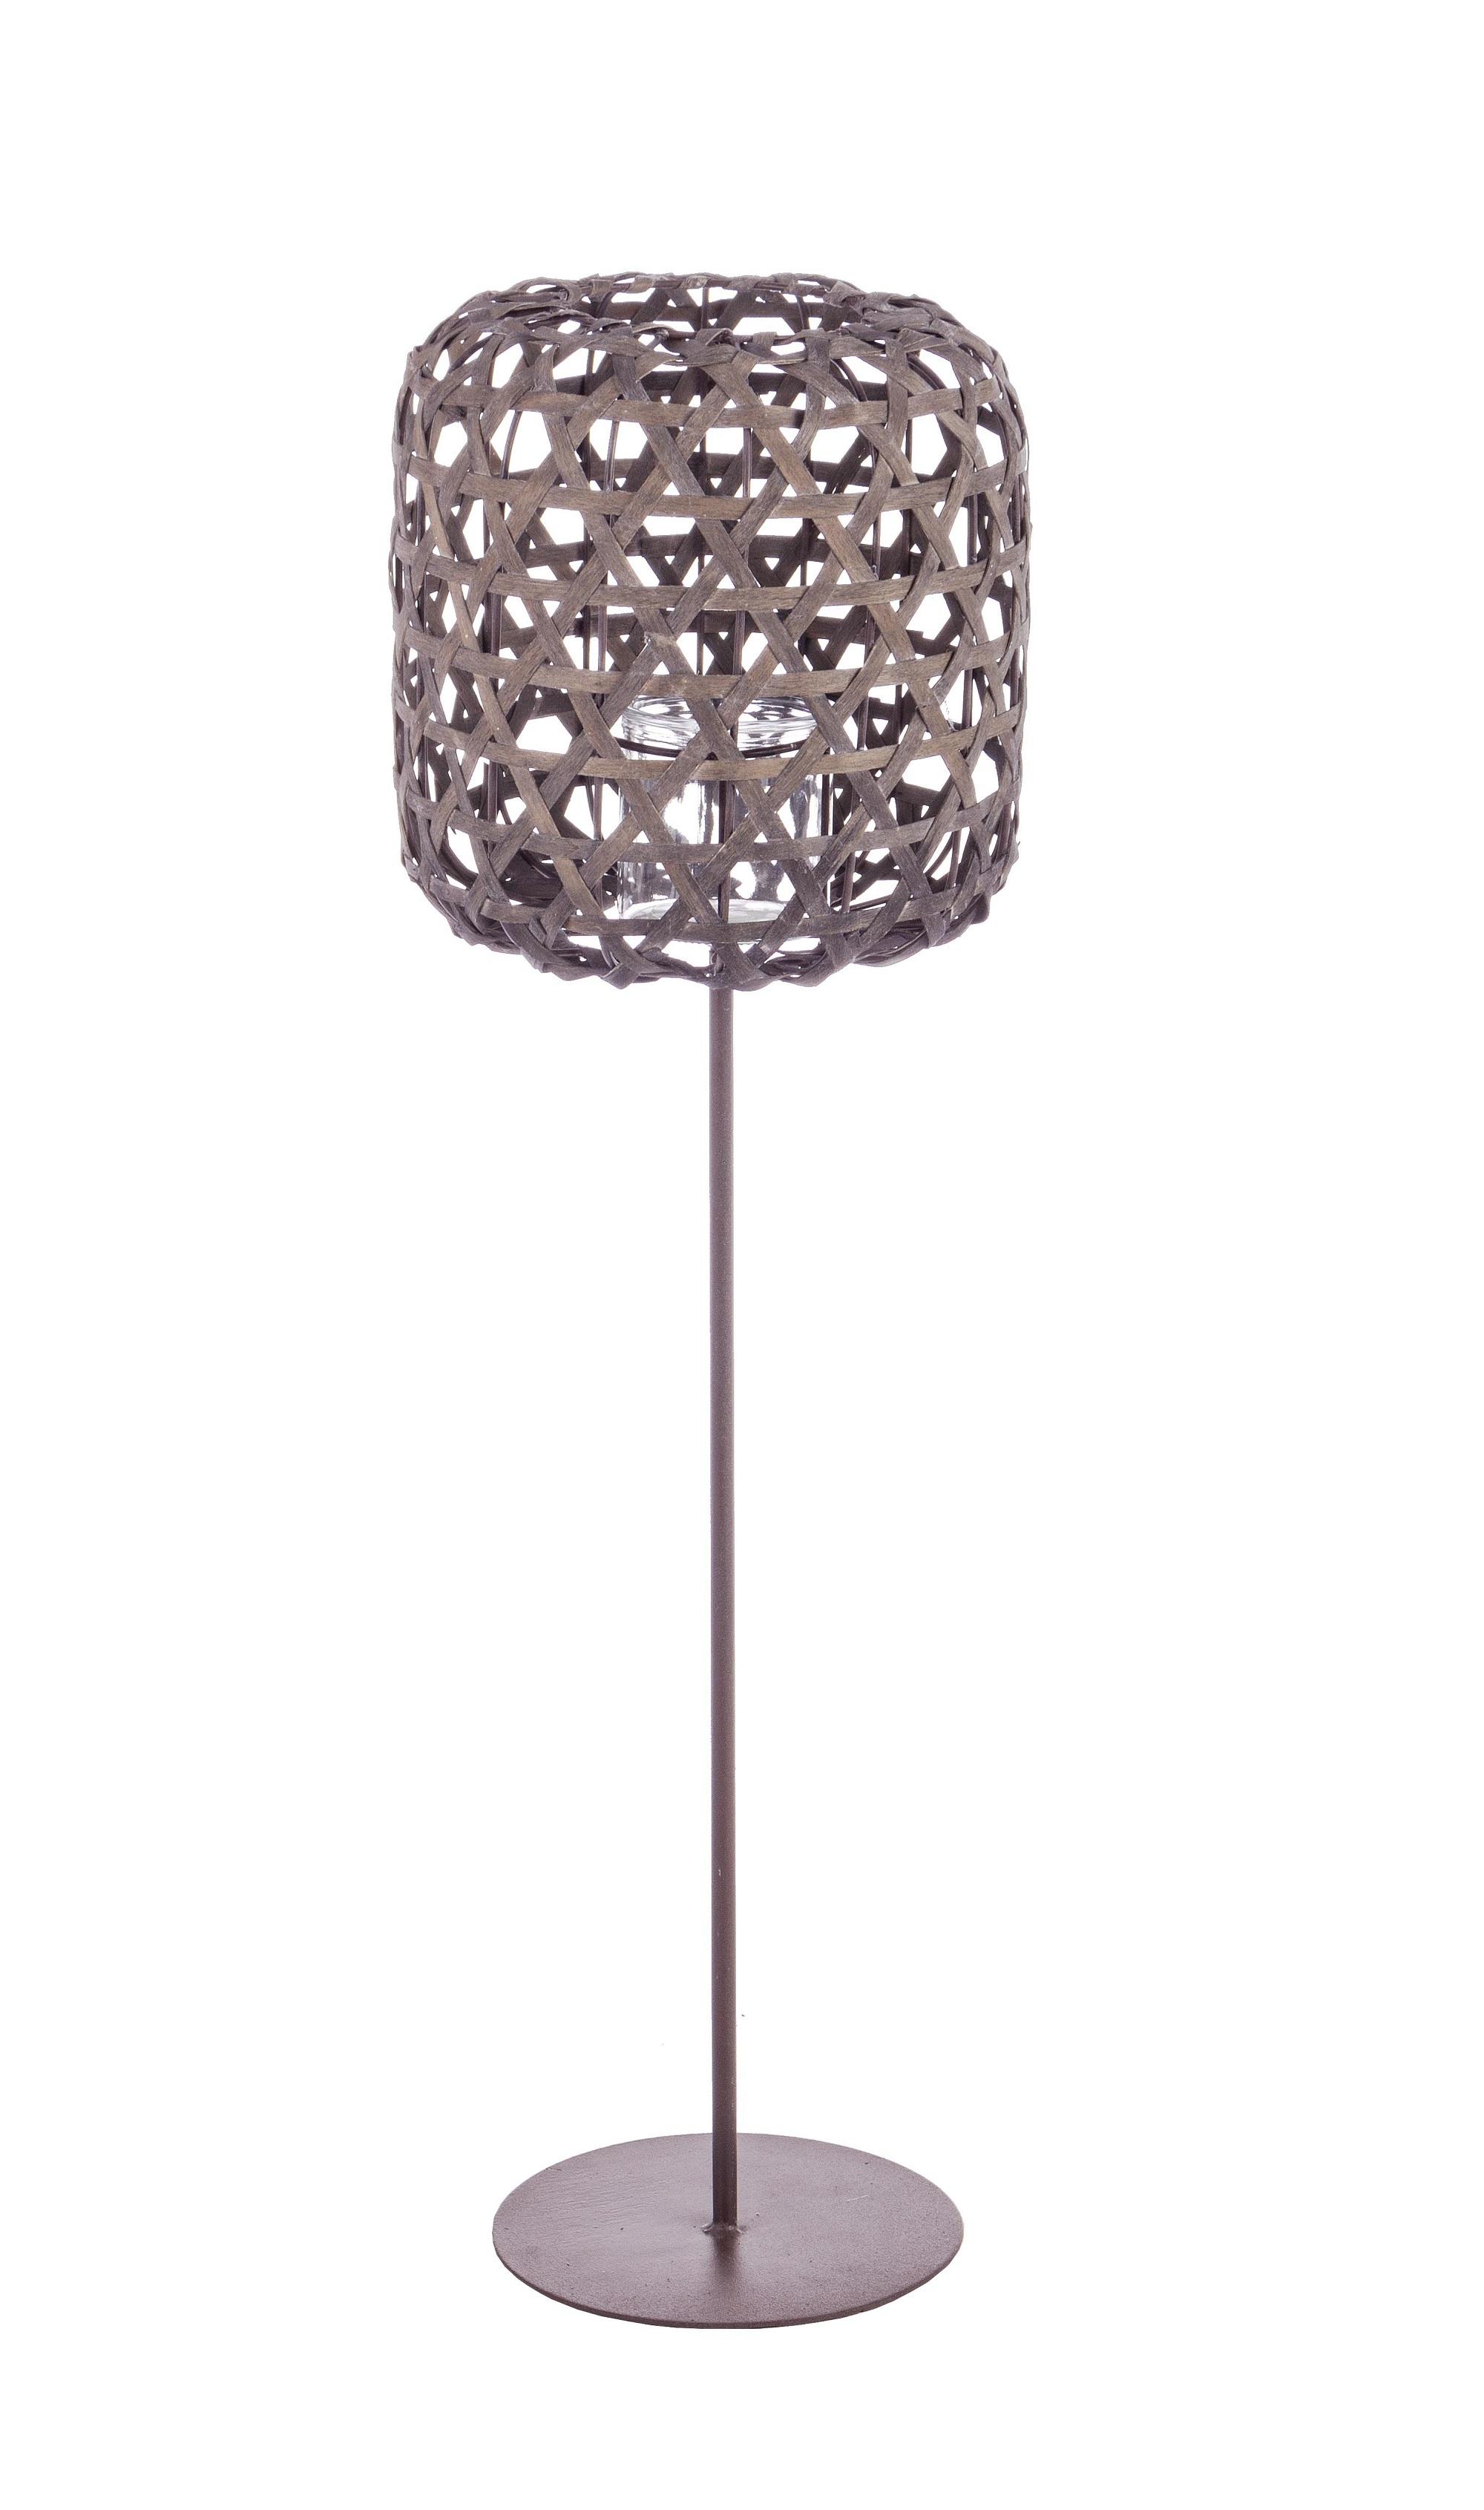 Suport lumanare din metal Shade Tall Gri, l21xA23xH74 cm imagine